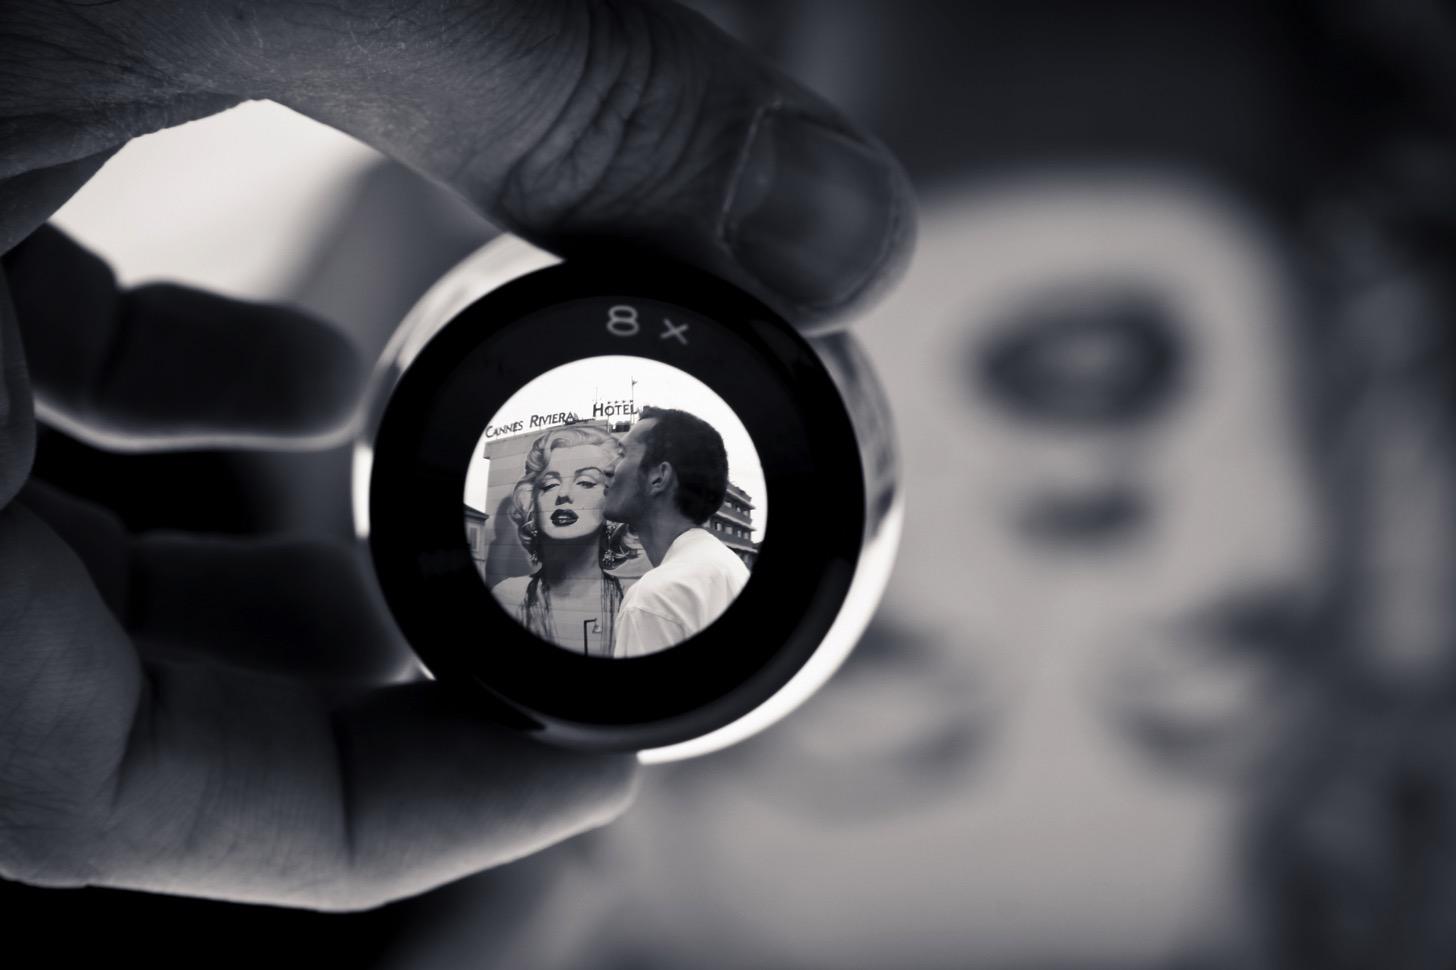 iPhone/iPadのカメラを虫眼鏡や望遠鏡のように使える「拡大鏡」